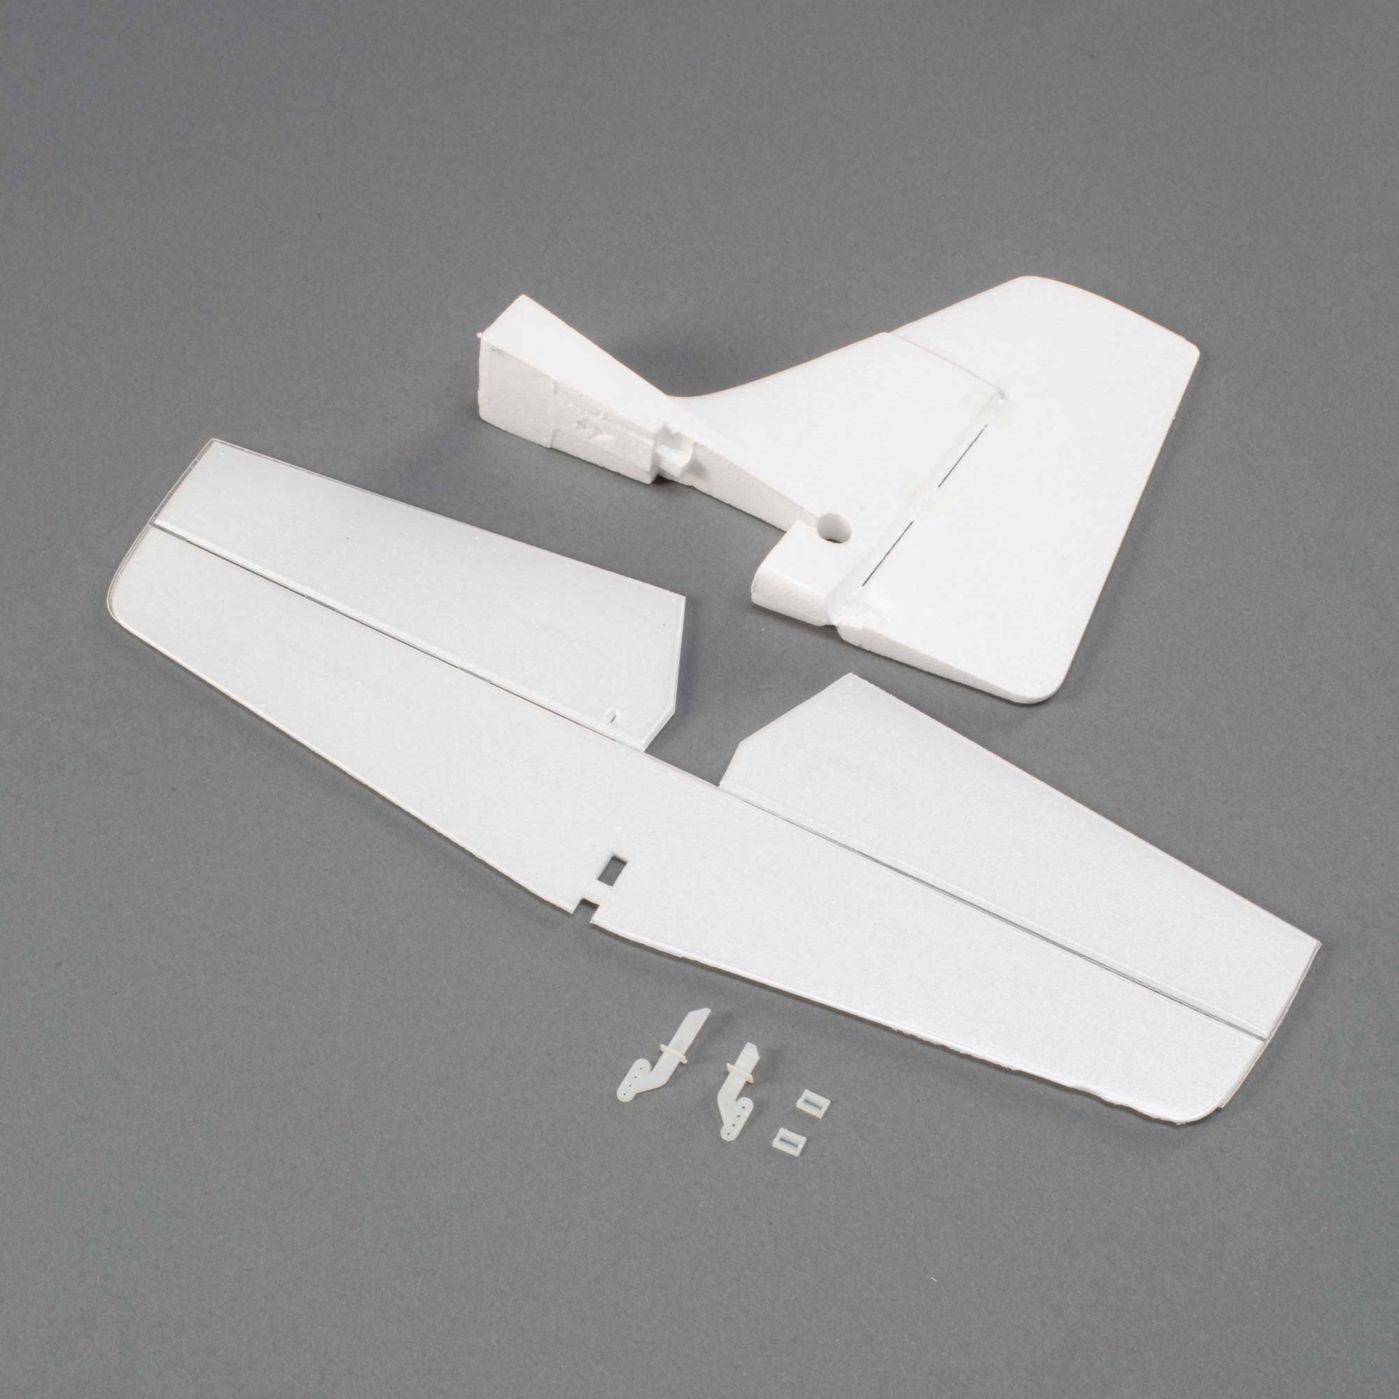 E-Flite Tail Set: UMX Turbo Timber